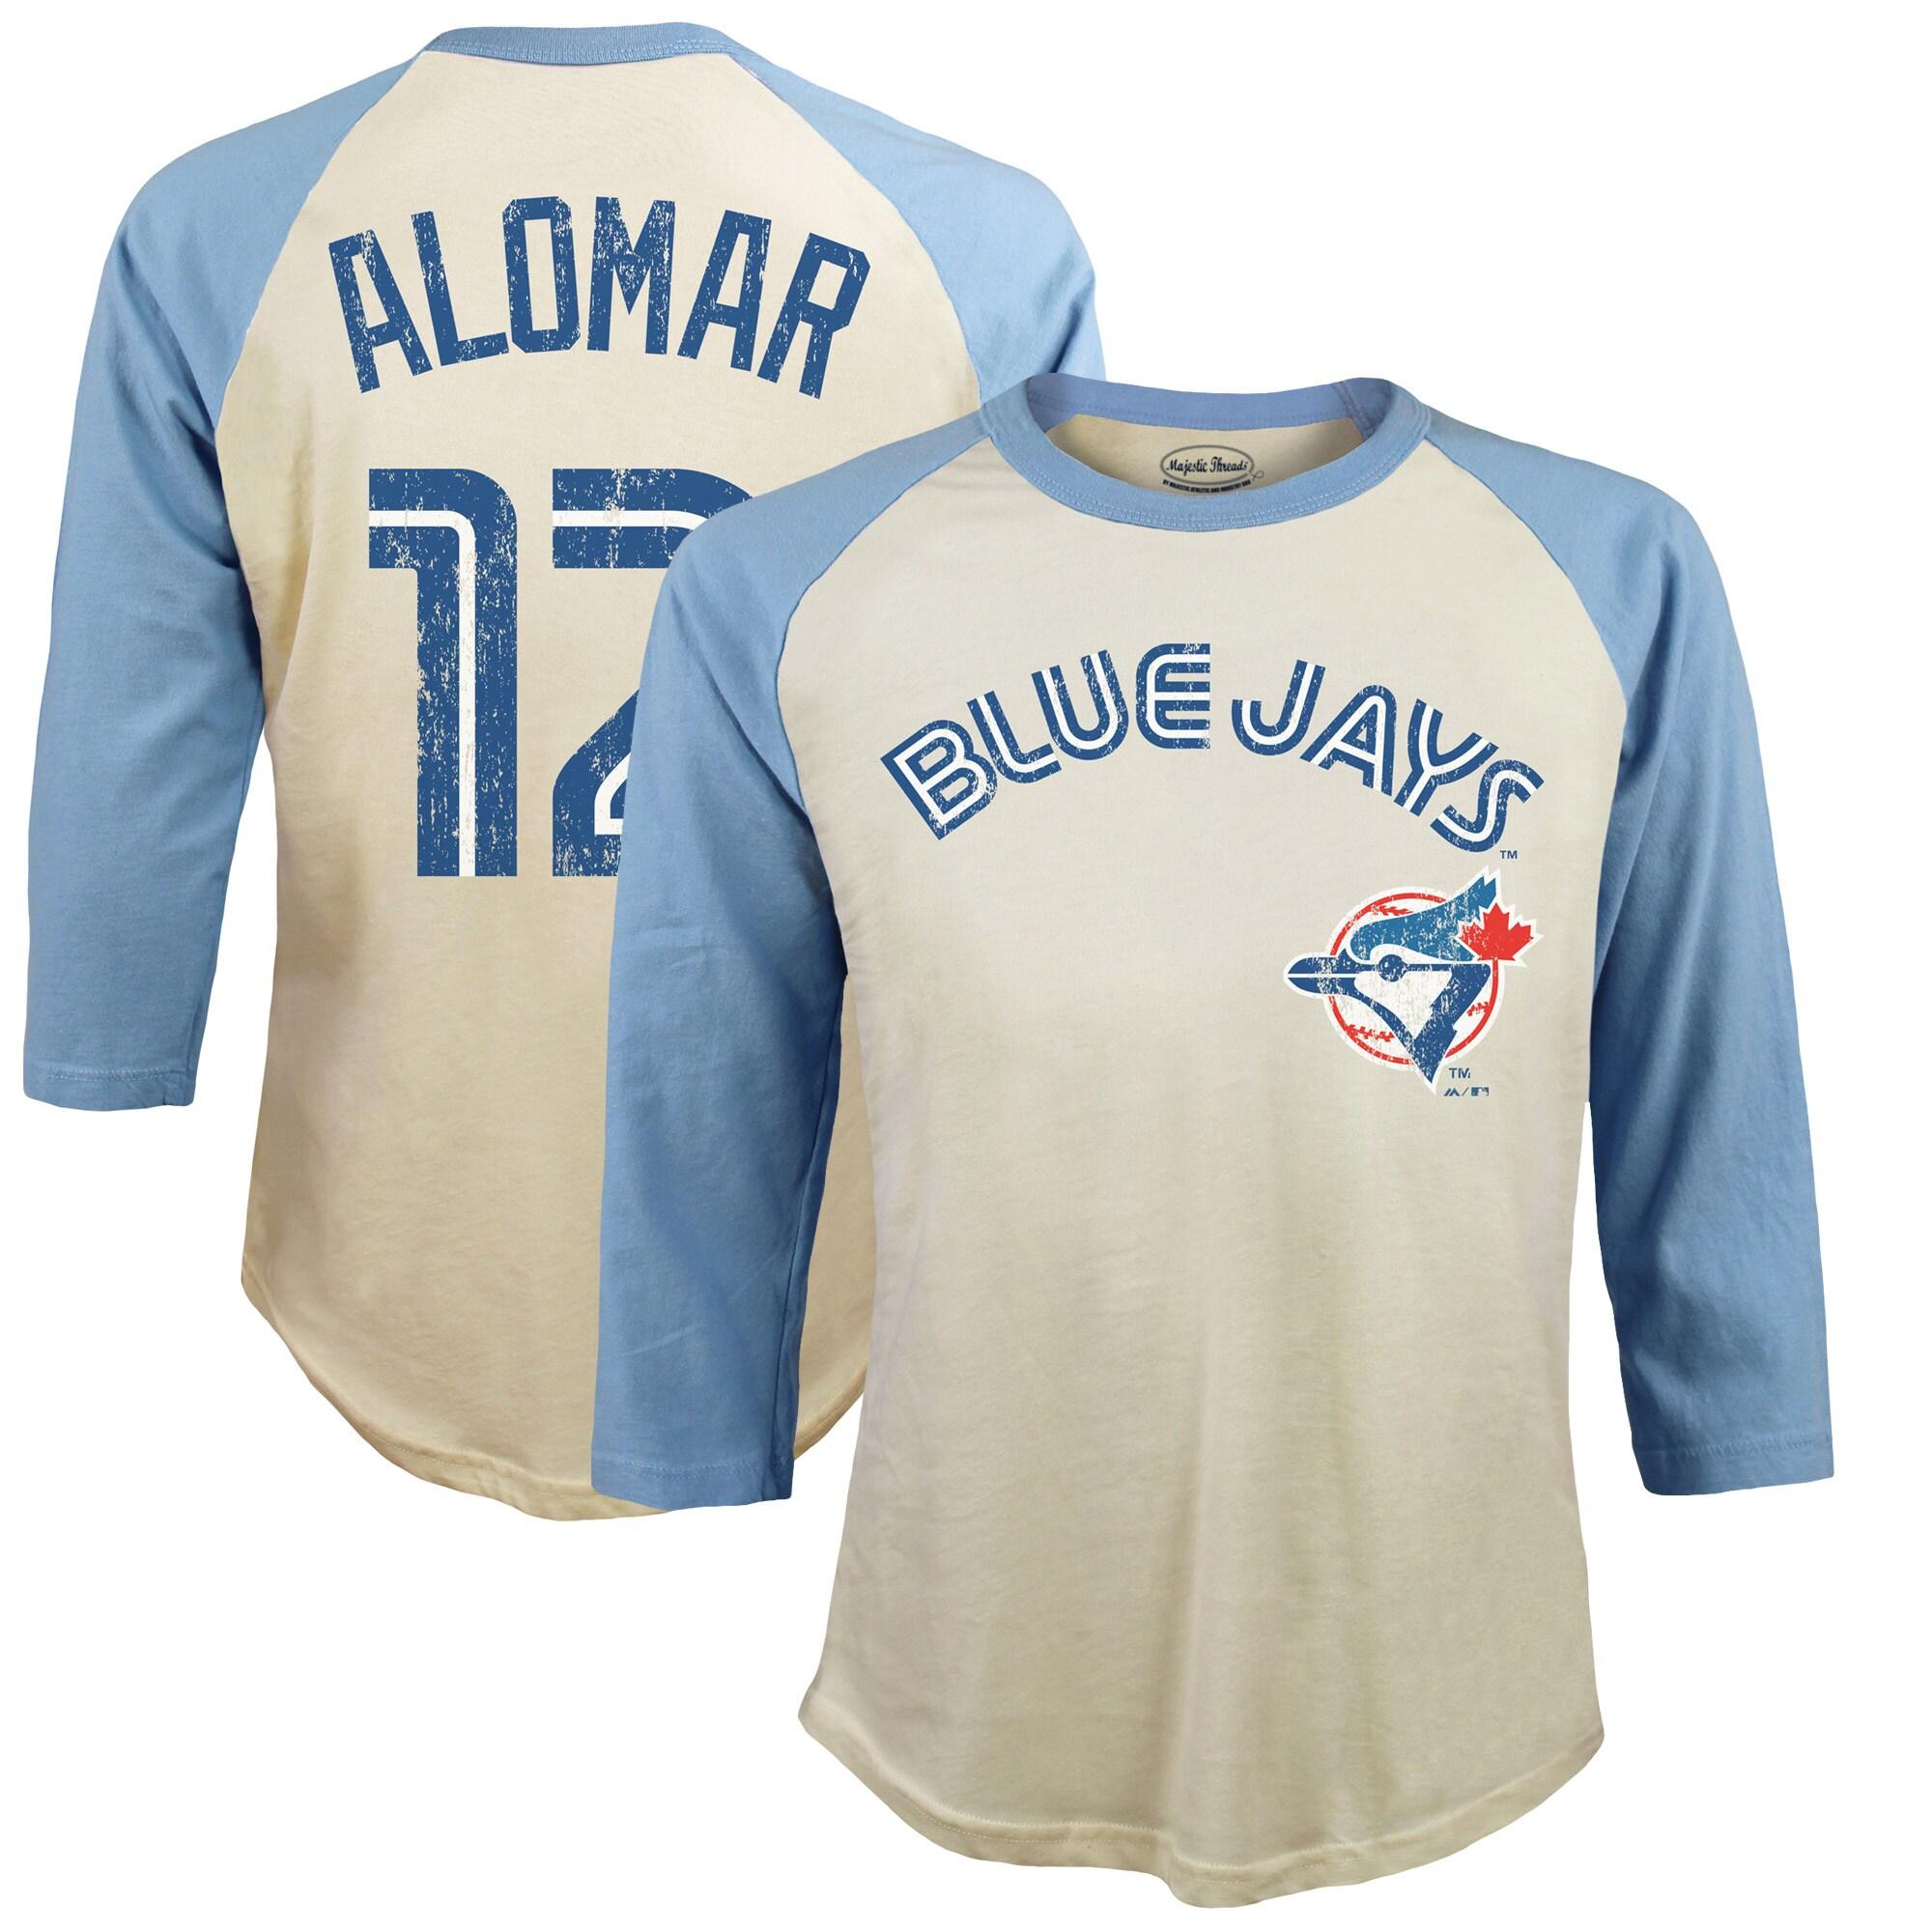 Roberto Alomar Toronto Blue Jays Majestic Threads Softhand Cotton Cooperstown 3/4-Sleeve Raglan T-Shirt - Cream